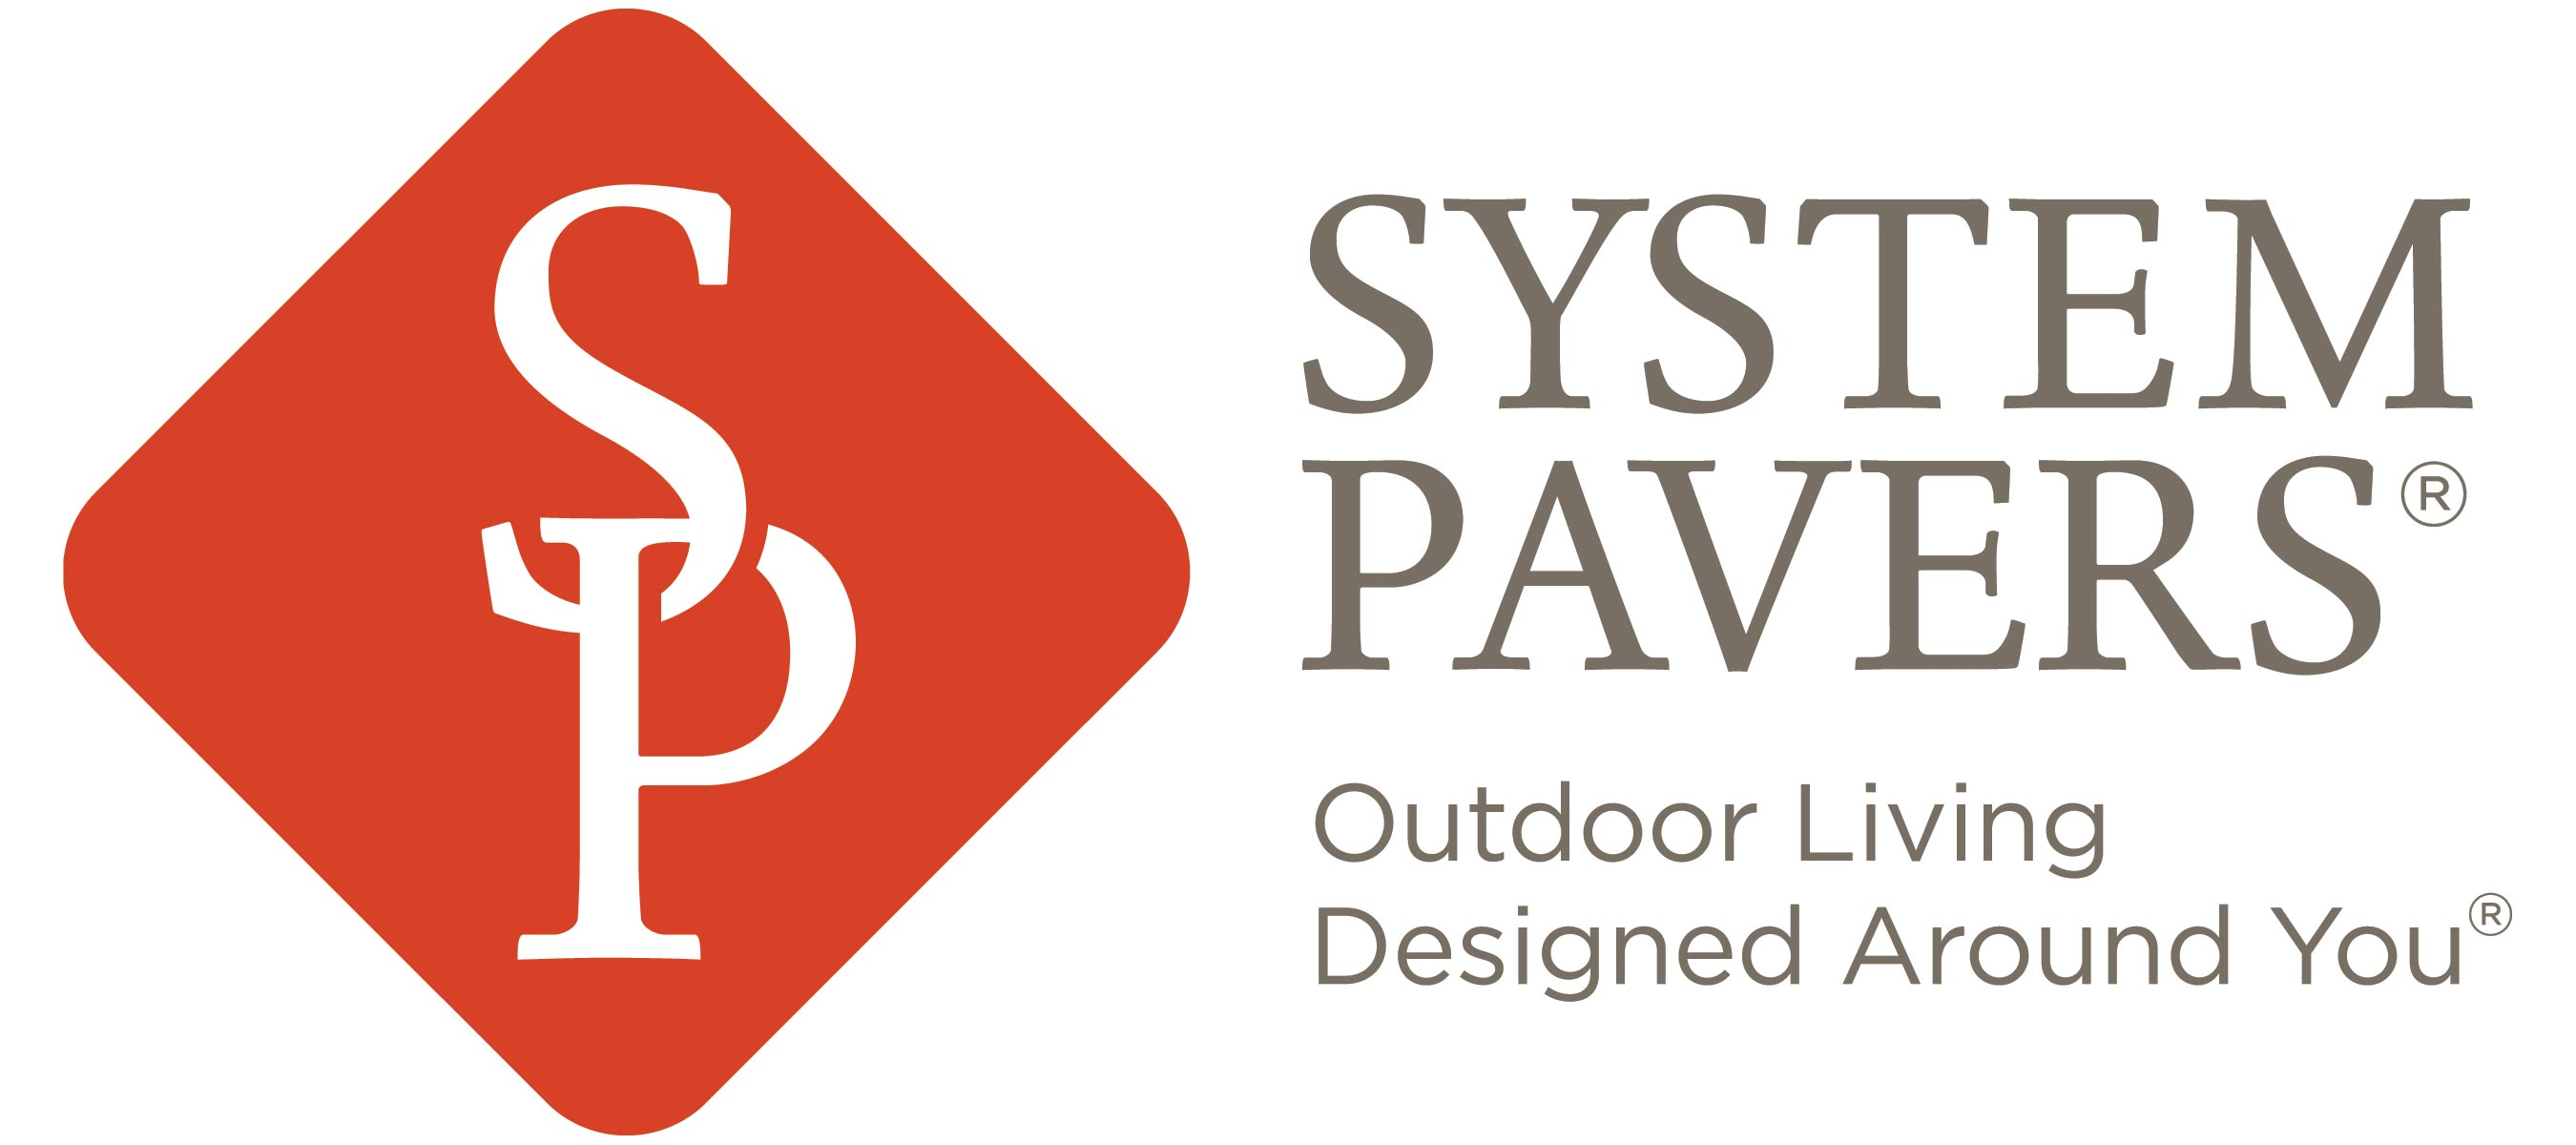 System Pavers logo